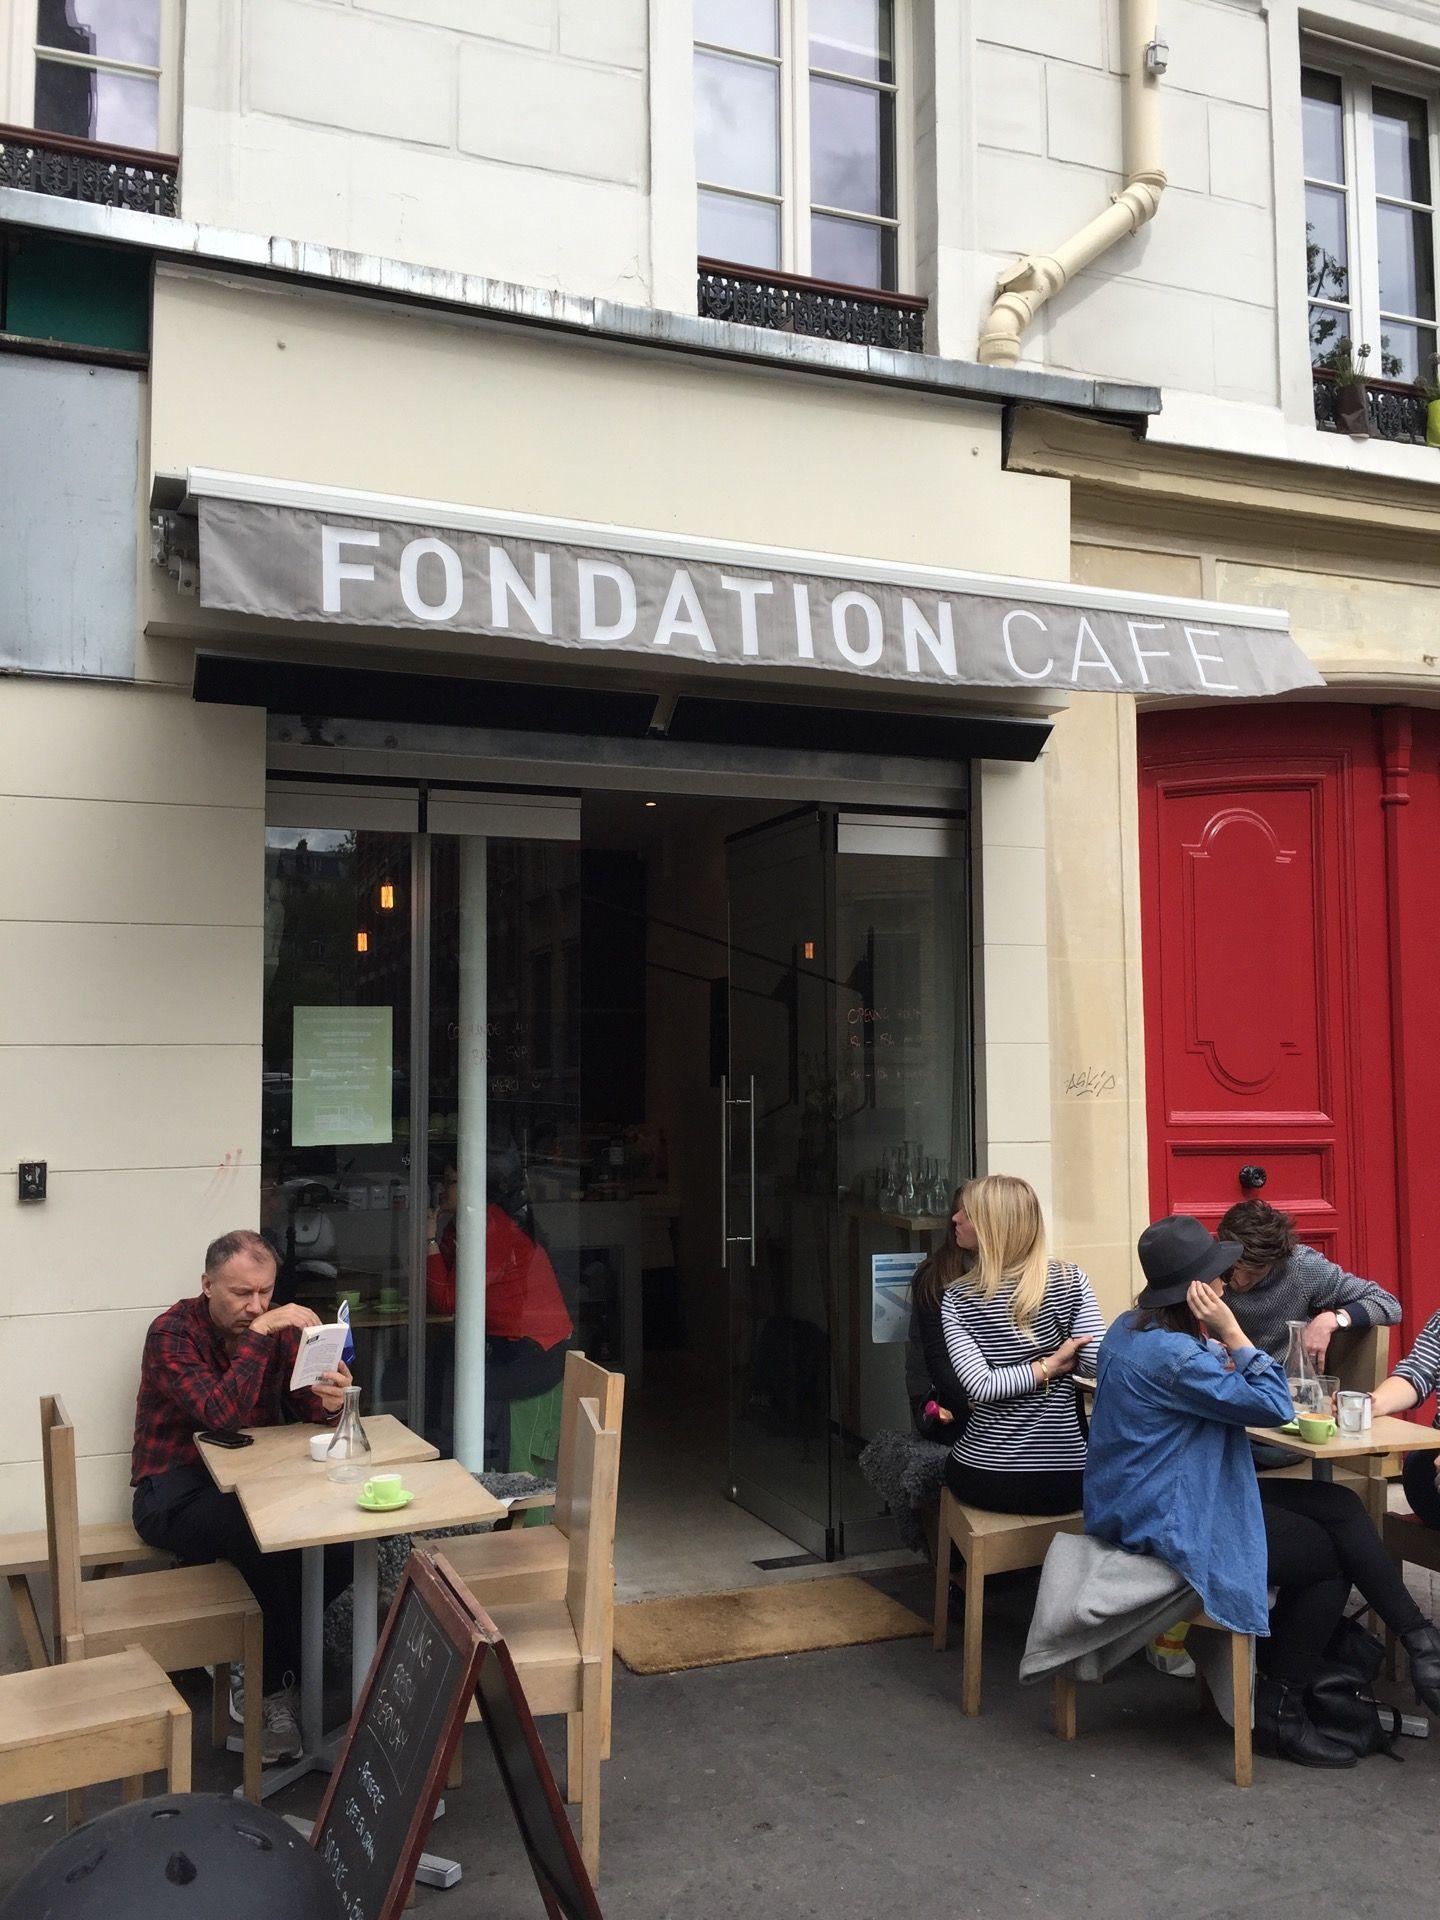 Fondation Café in Paris, ÎledeFrance Lost in Cheeseland